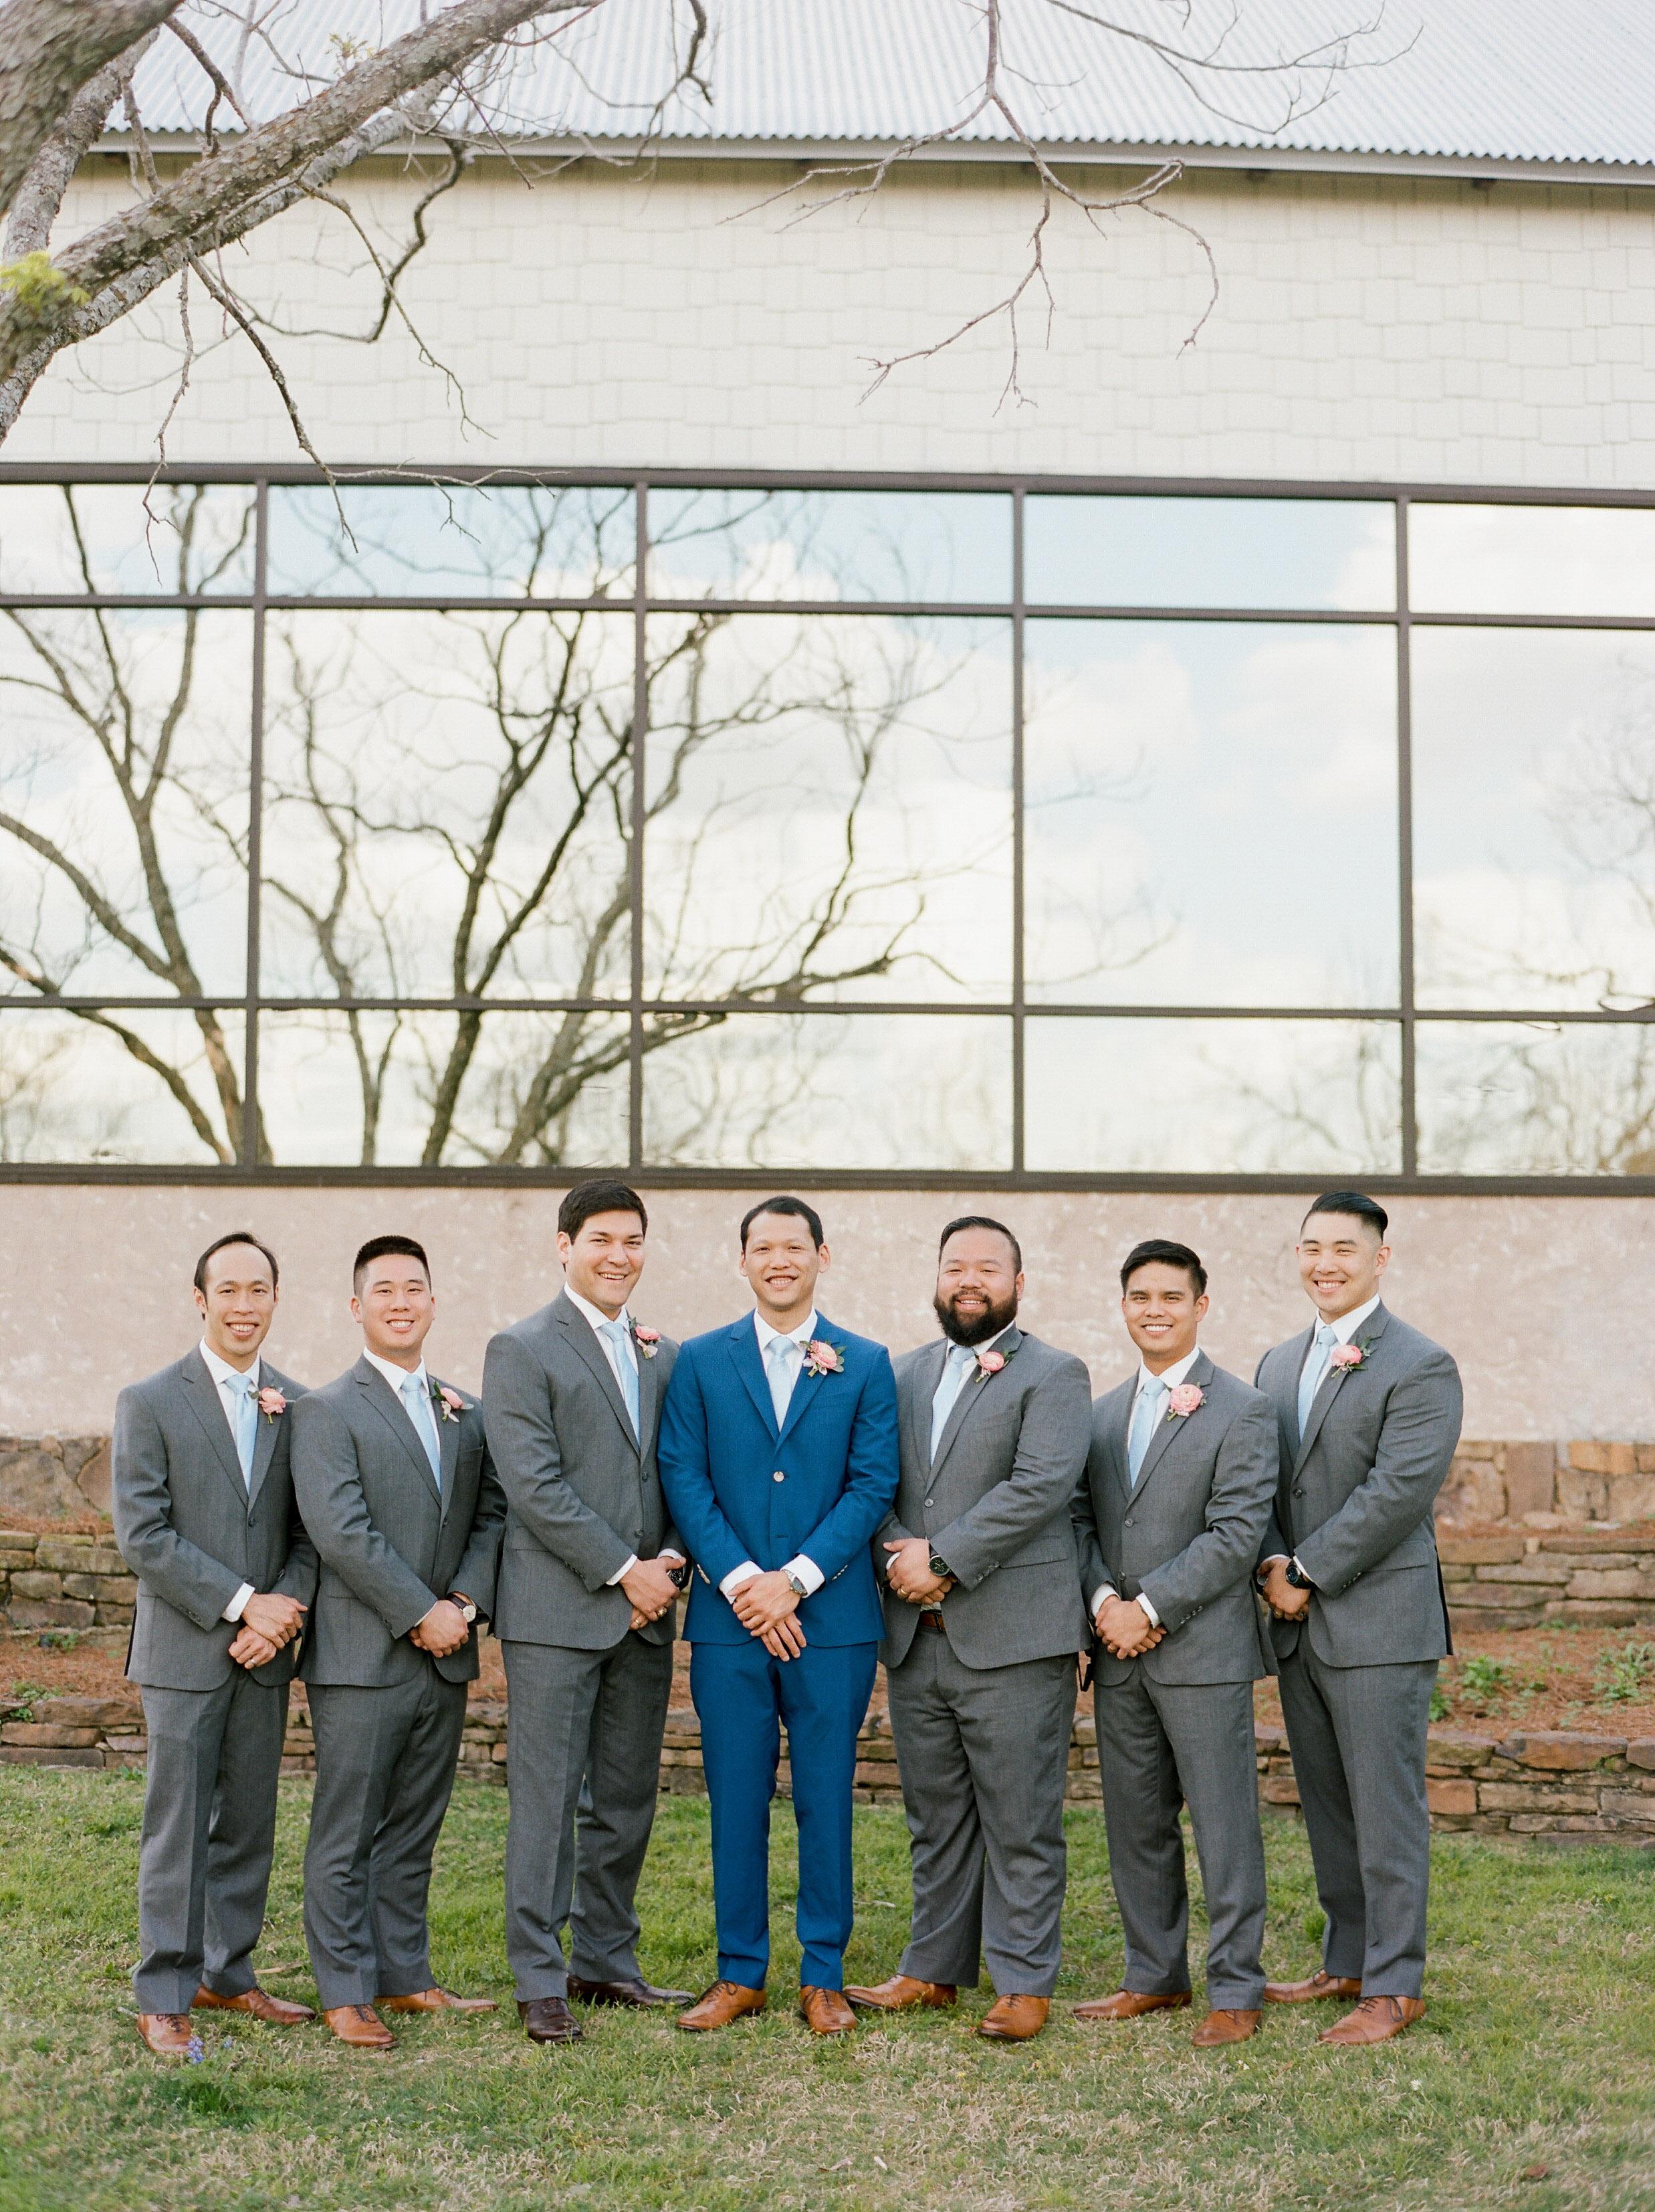 The-Knot-50-Weddings-50-States-Texas-Winner-Dana-Fernandez-photography-houston-wedding-photographer-film-fine-art-destination-18.jpg